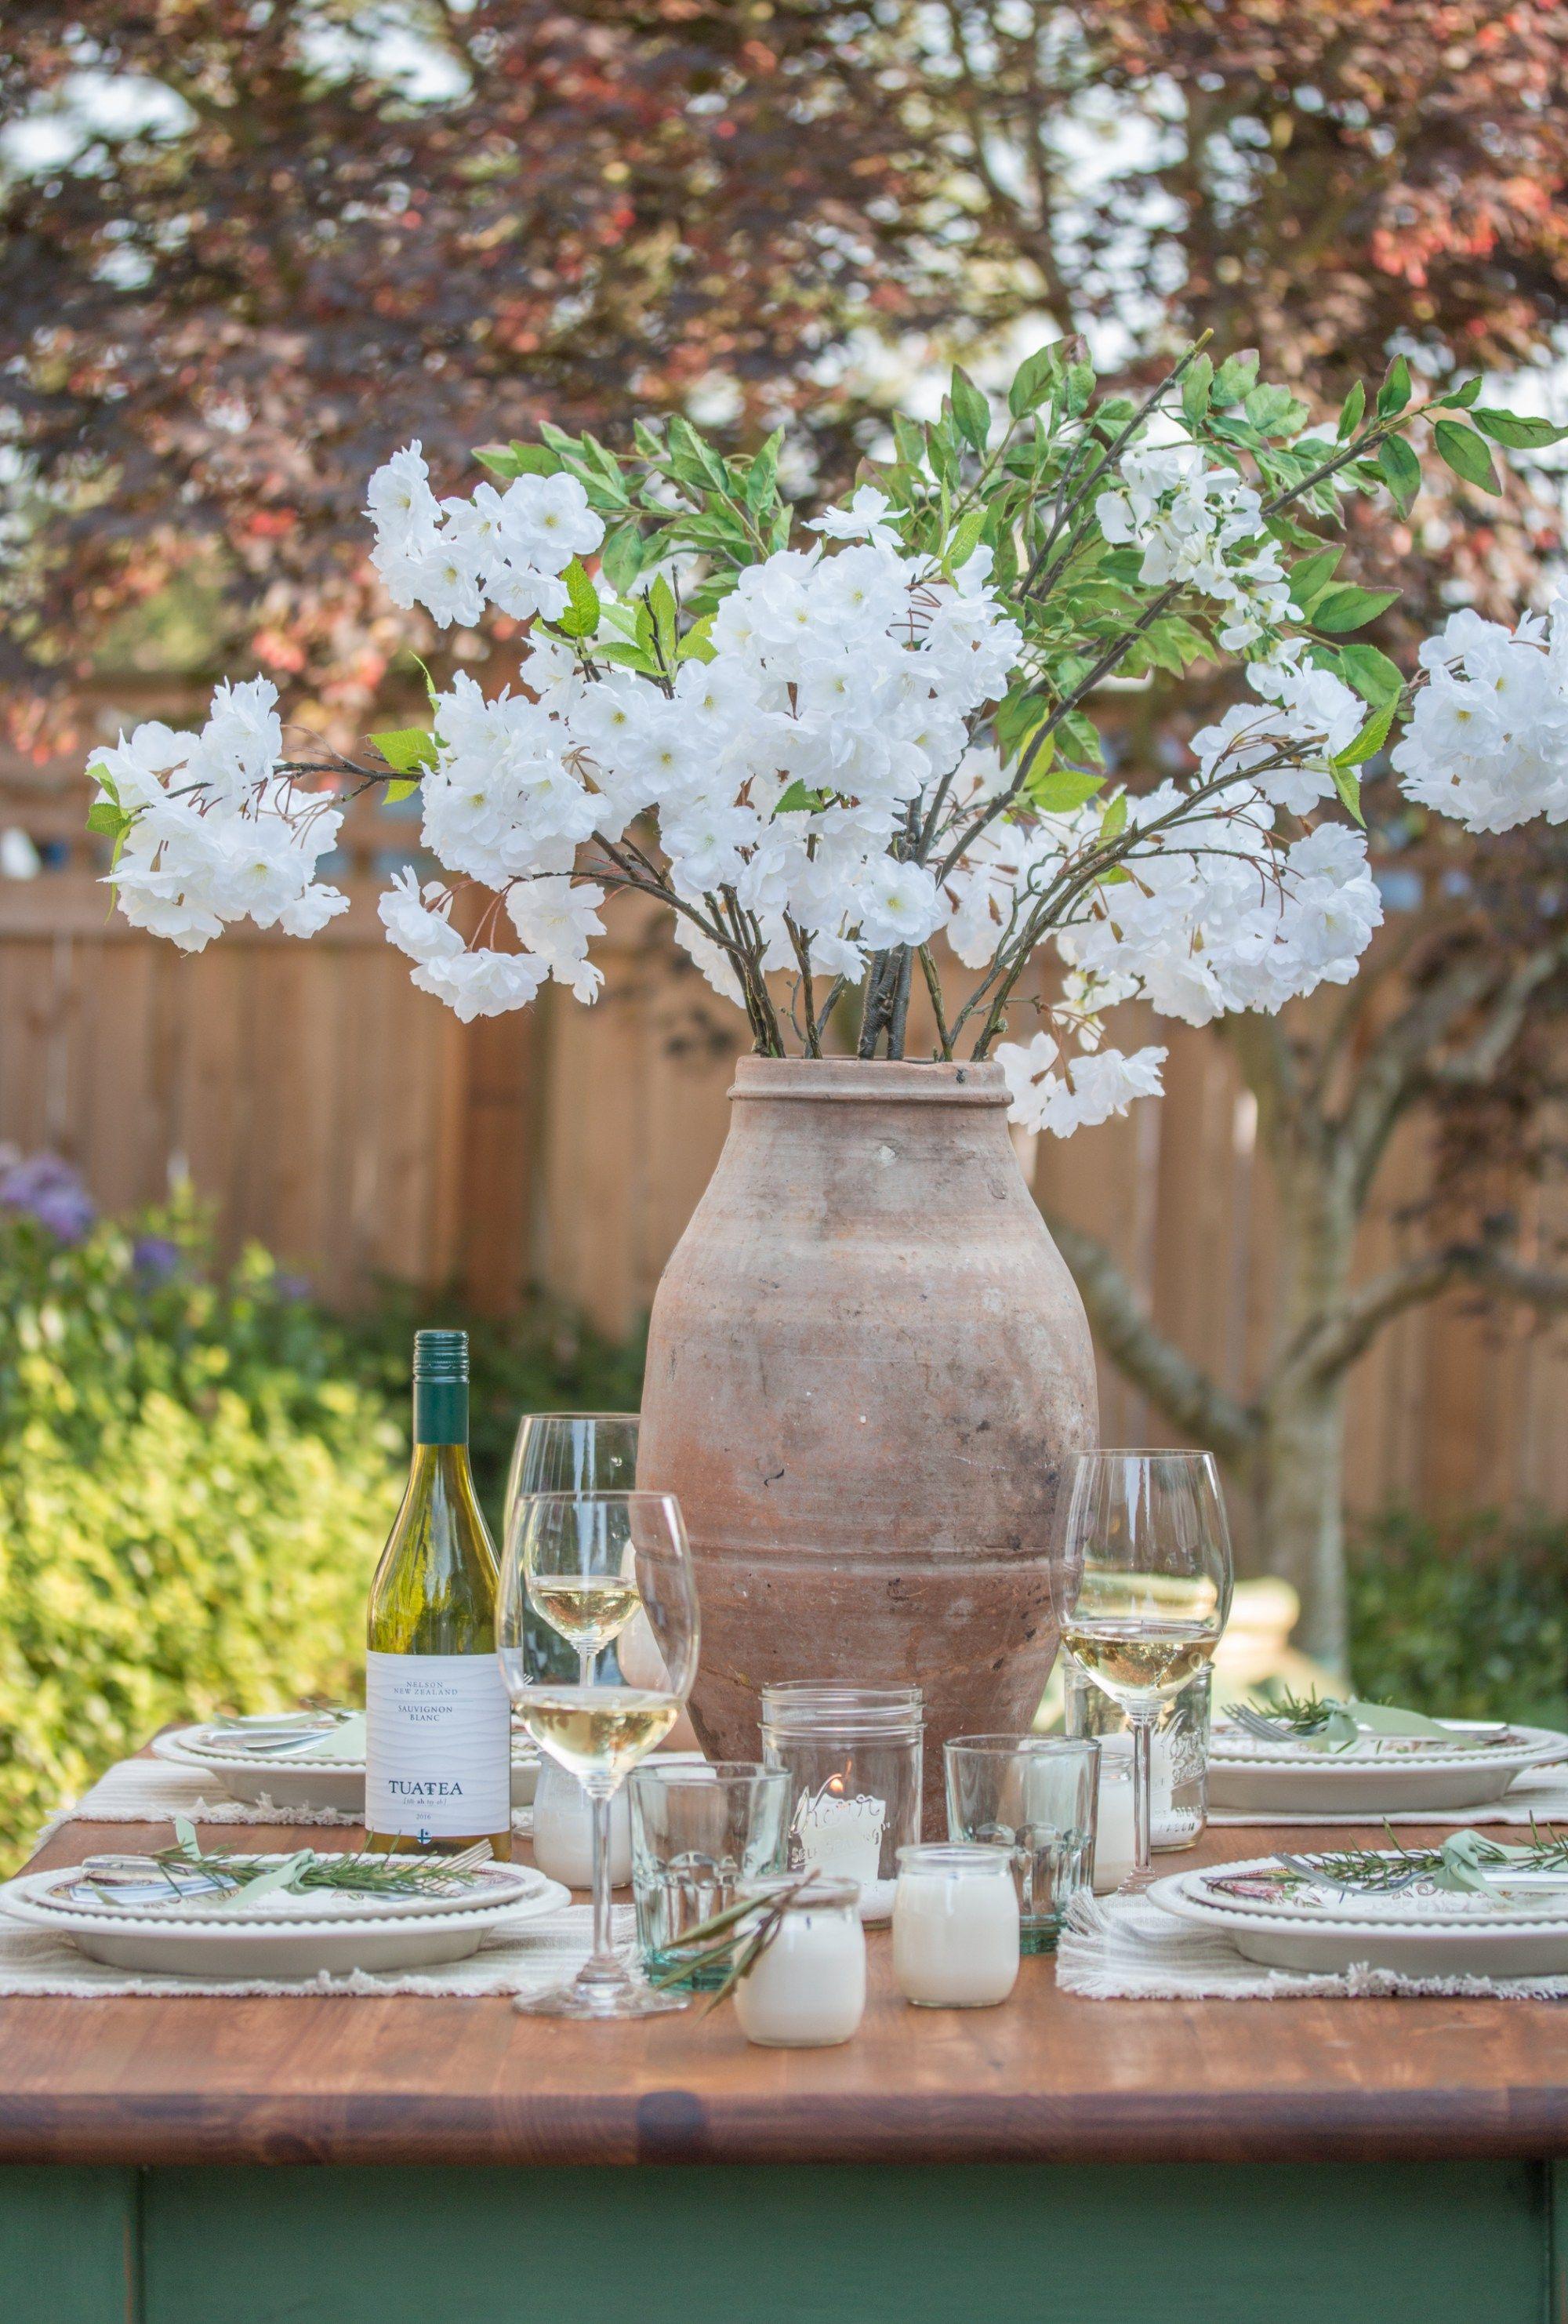 Magnolia Green Farm Table Diy Table Saw Table Magnolia